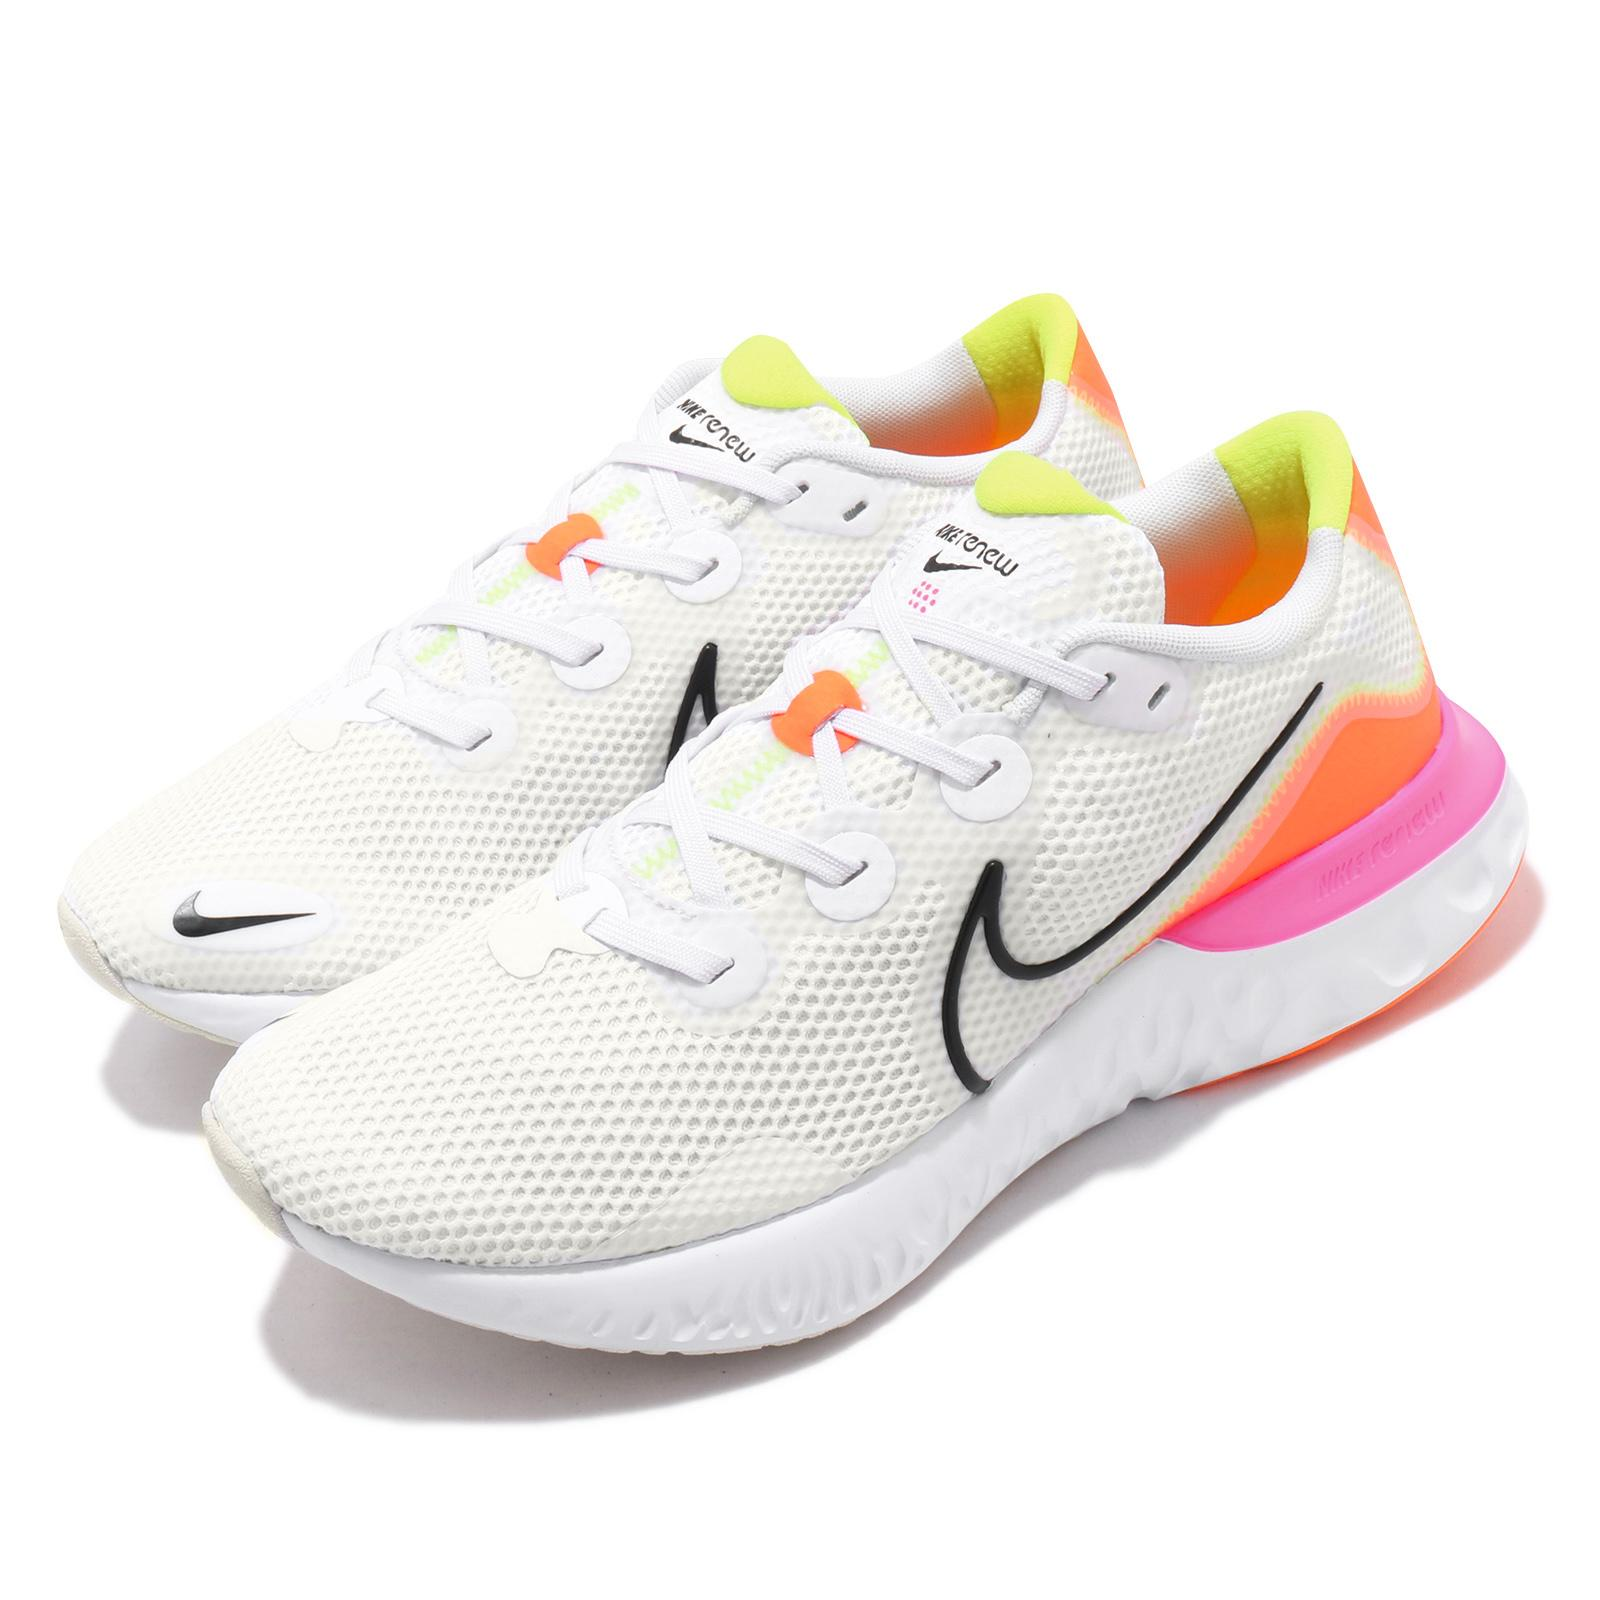 usted está Onza estafador  Nike Renew Run White Black Orange Pink Yellow Men Running Shoes CK6357-100  | eBay